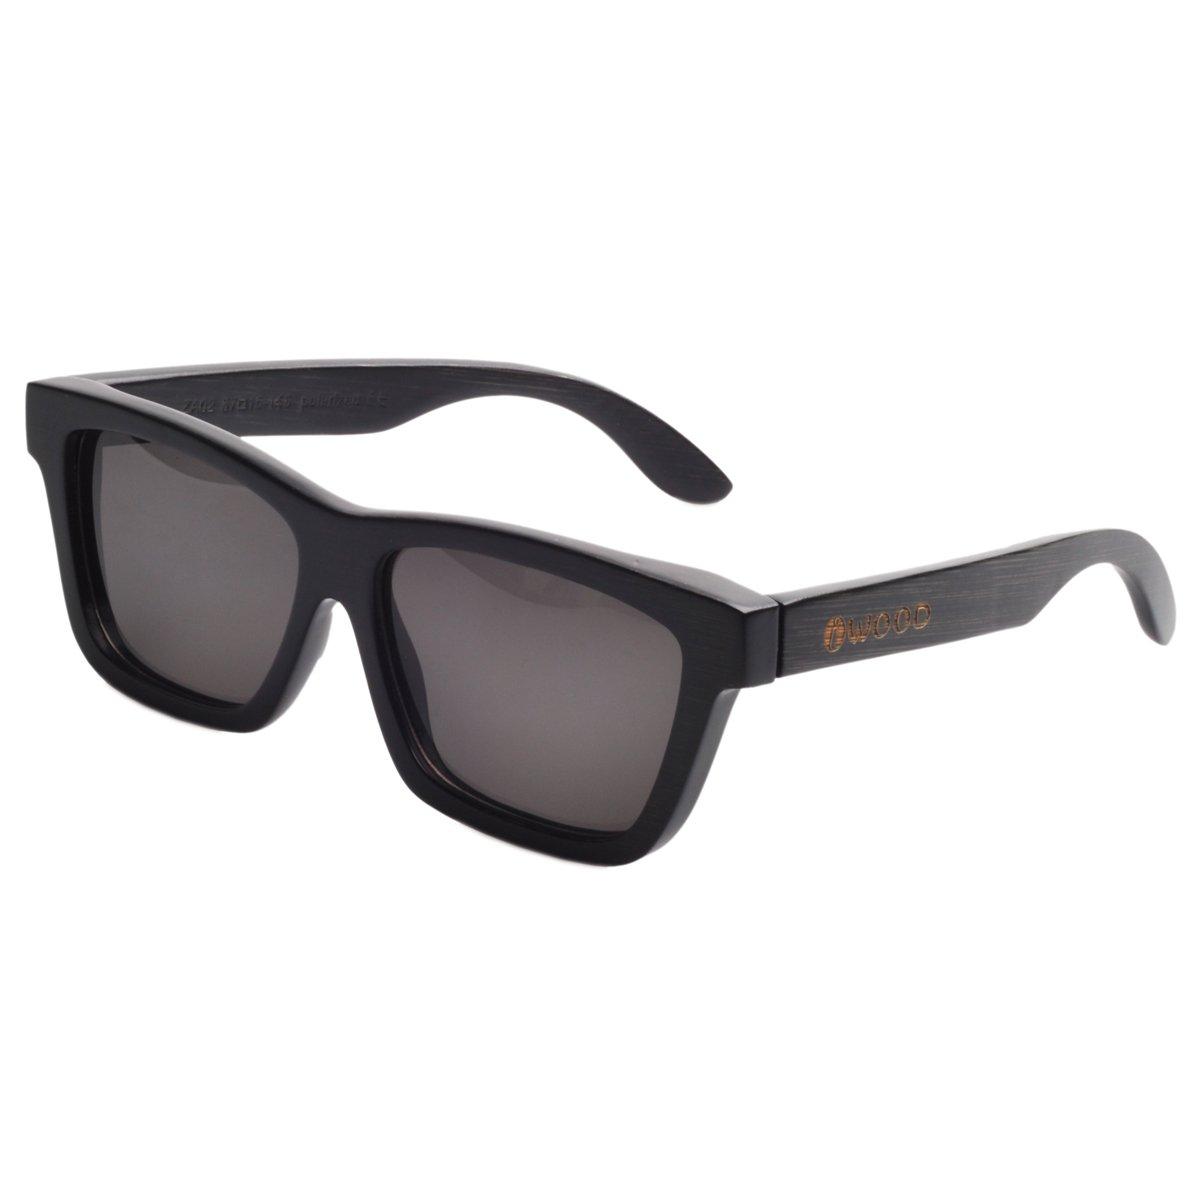 Iwood Marco de bambú Handcrafted Pintura Negro polarizado Gris lente Gafas de sol madera